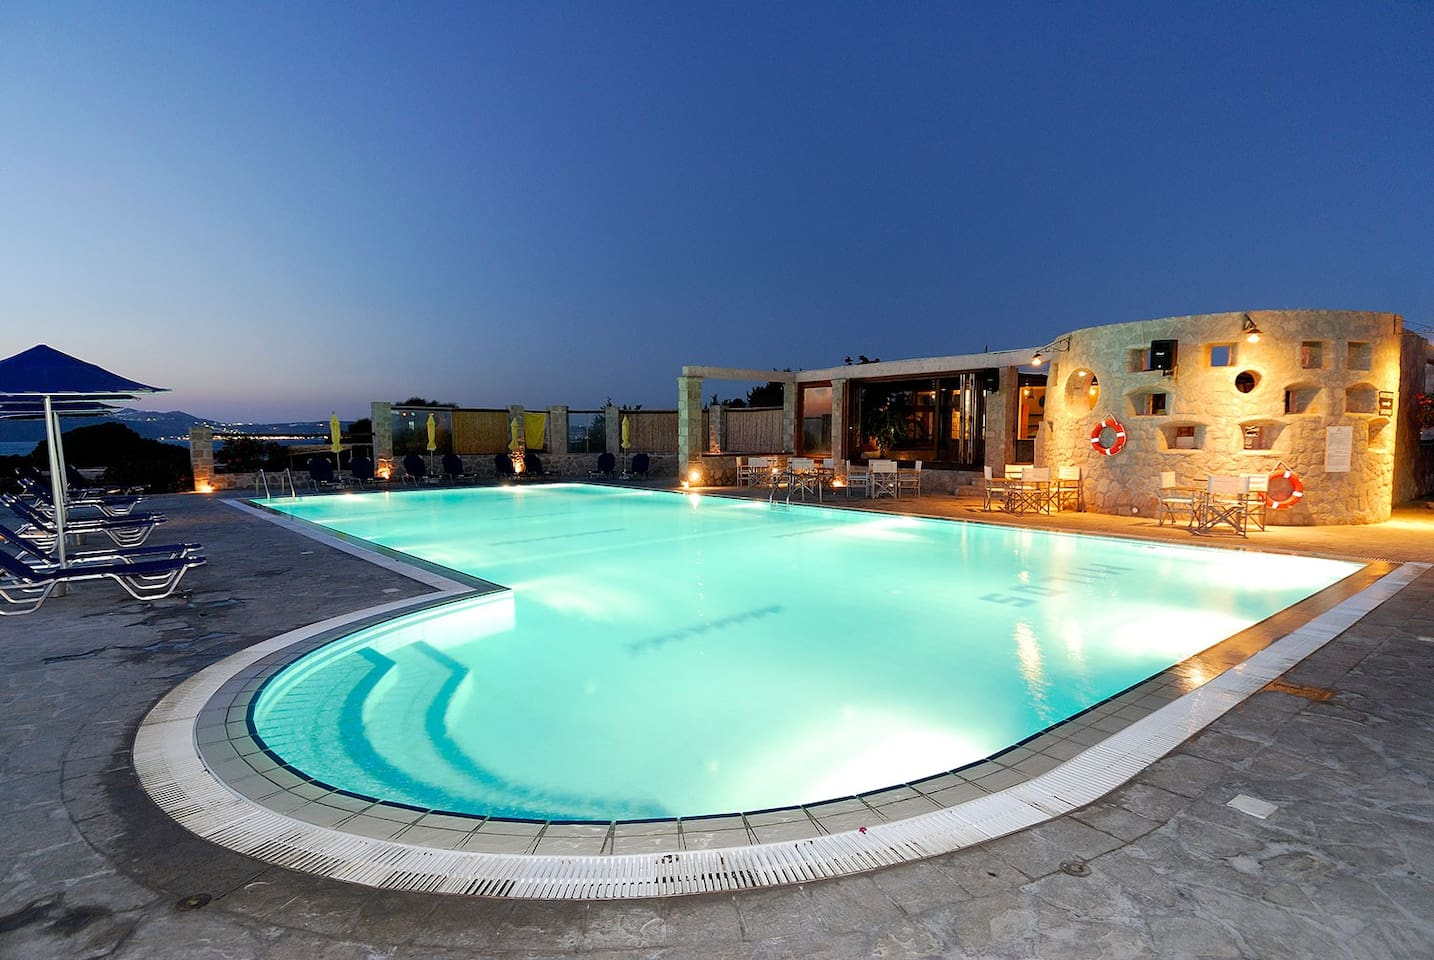 Shared swimming pool night view